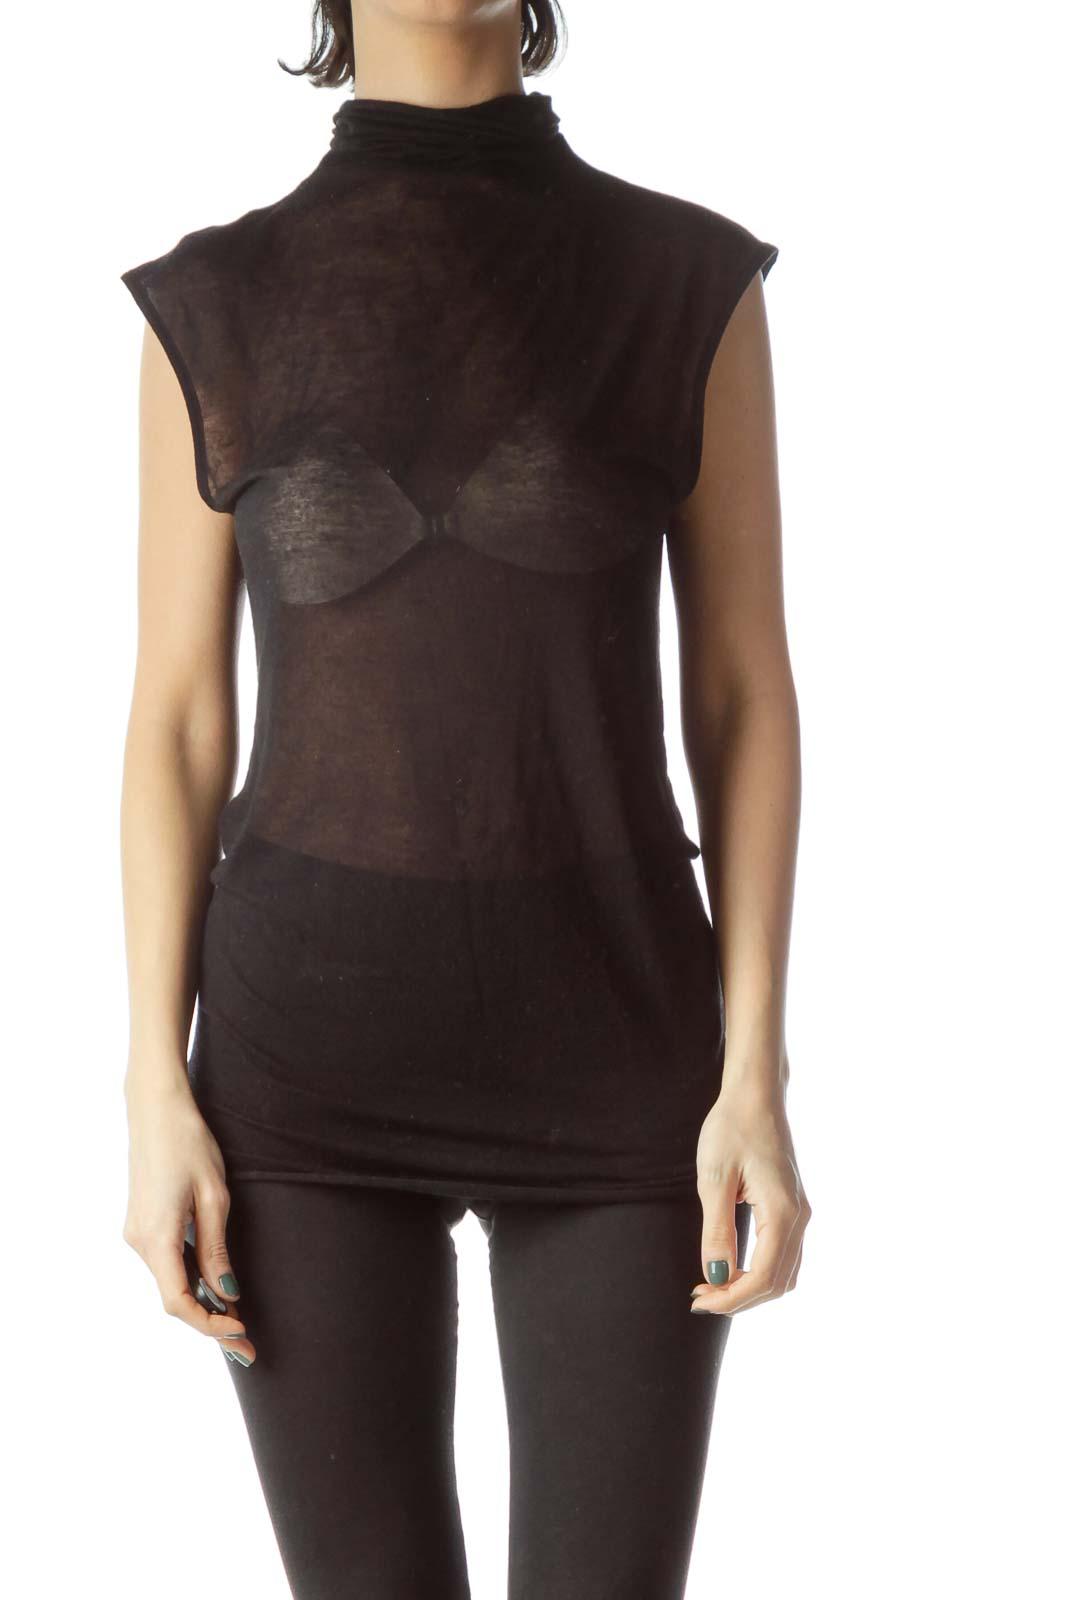 Black See-Through Turtle Neck Knit Vest Front